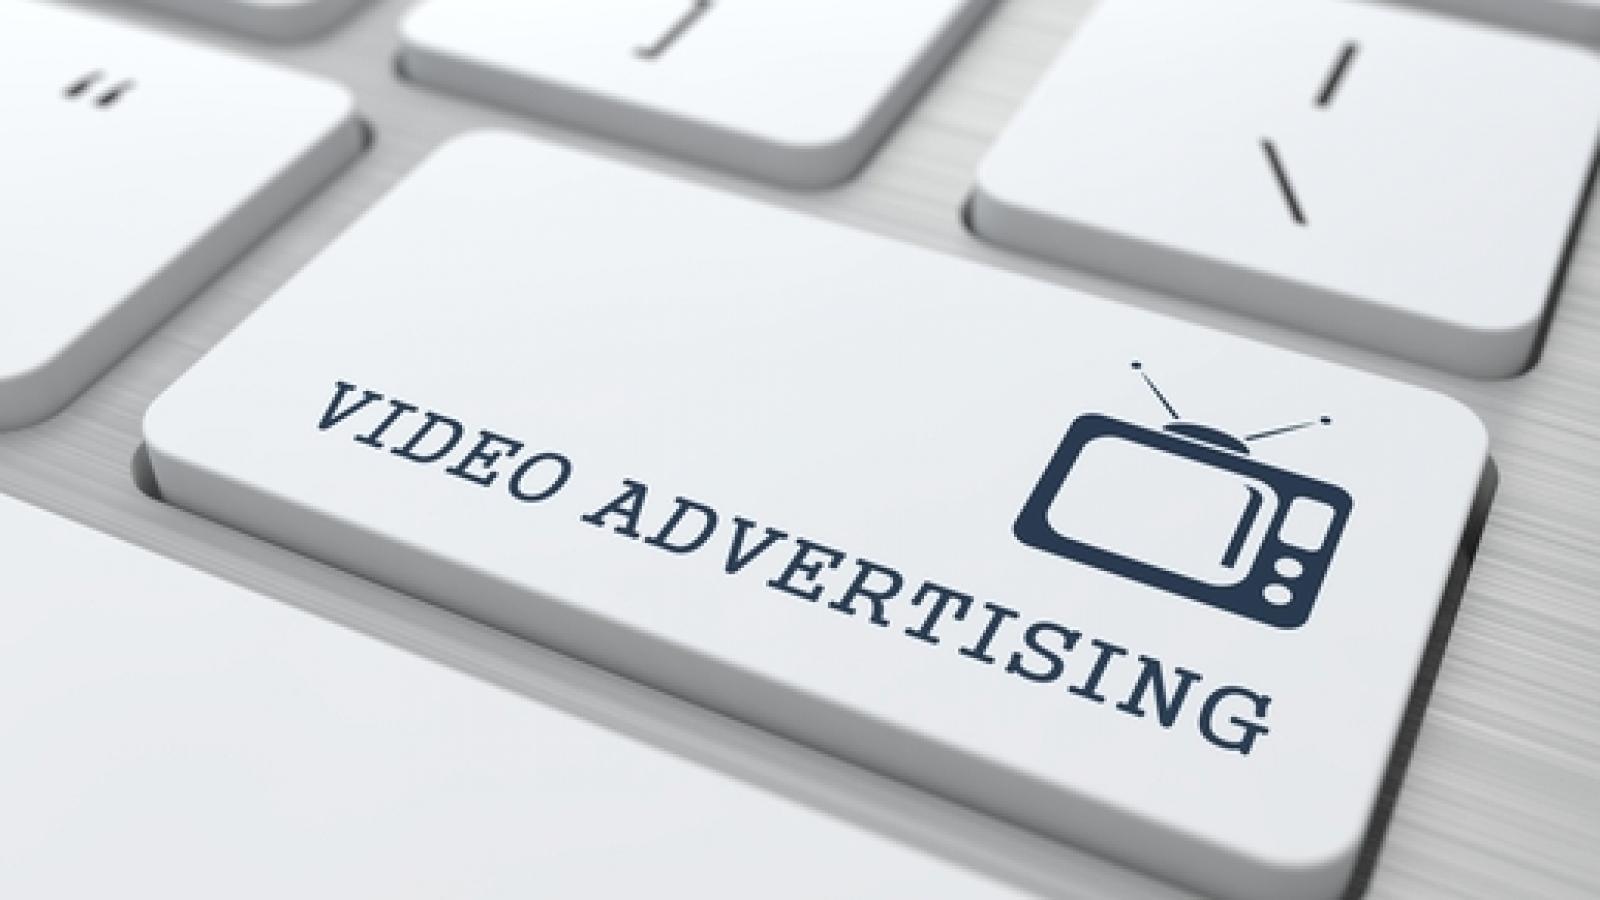 Video Advertising on White Keyboard Button.